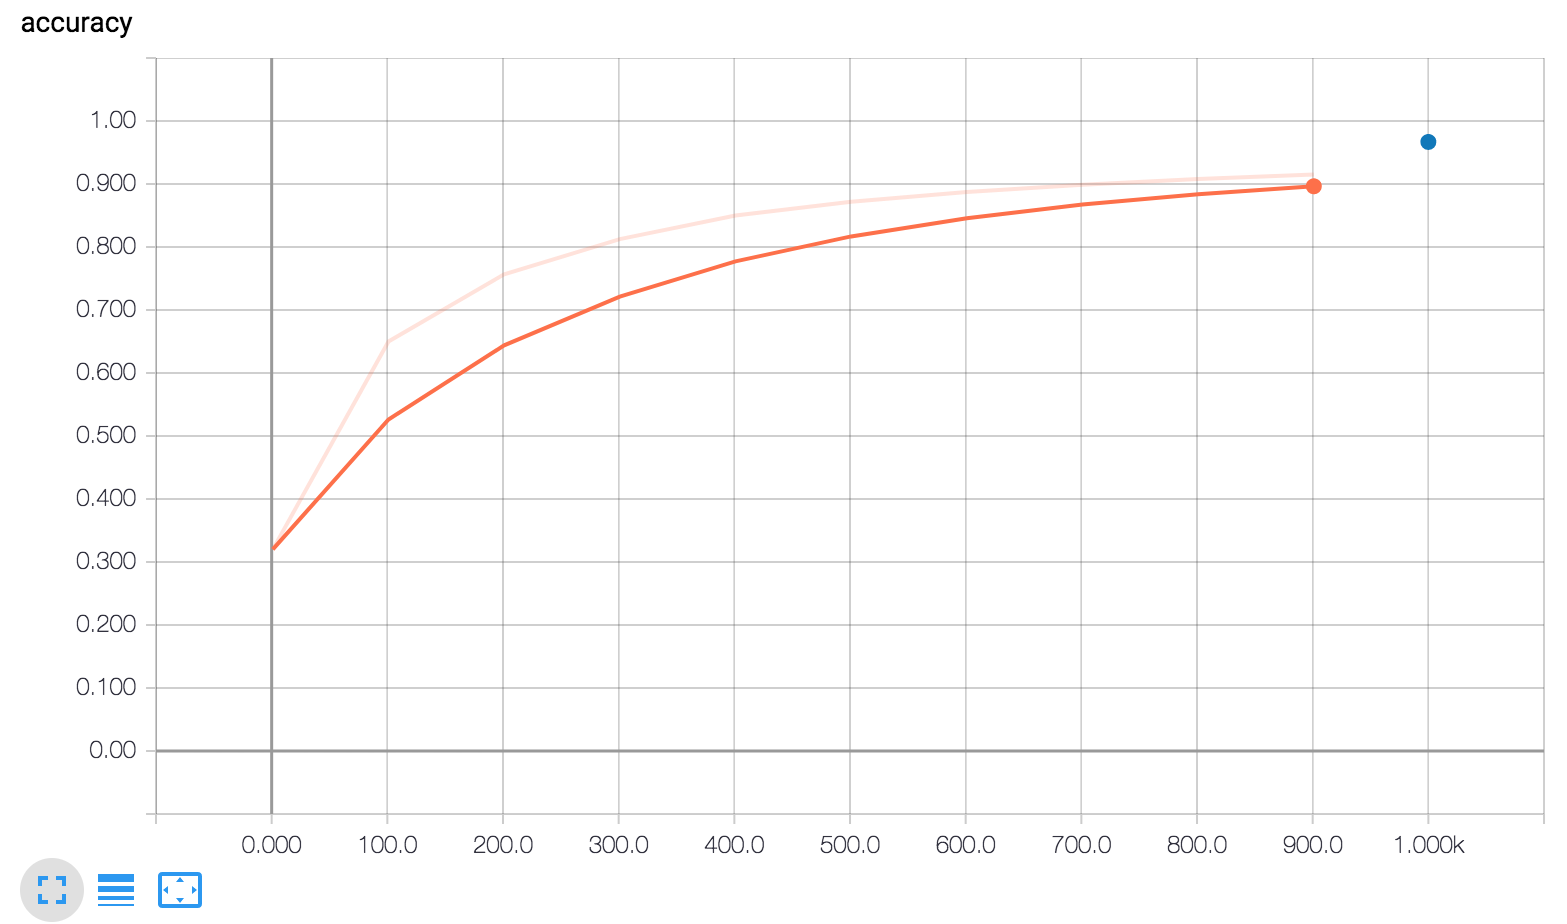 来自 Tensorboard 的准确率 'scalar' 图